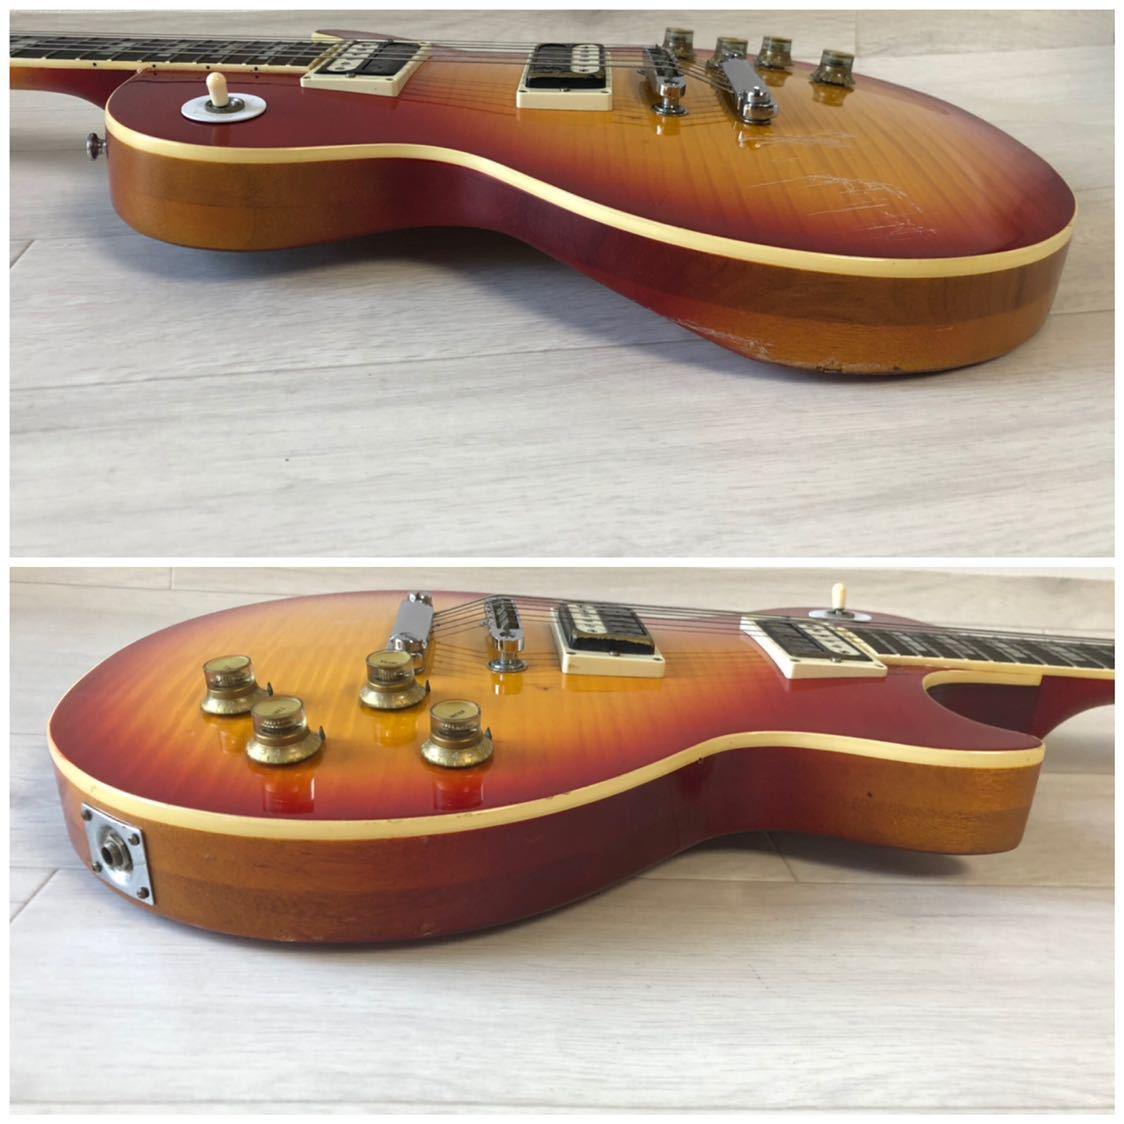 GRECO グレコ 中古 エレキギター 現状品 型番不明 ジャンク_画像5